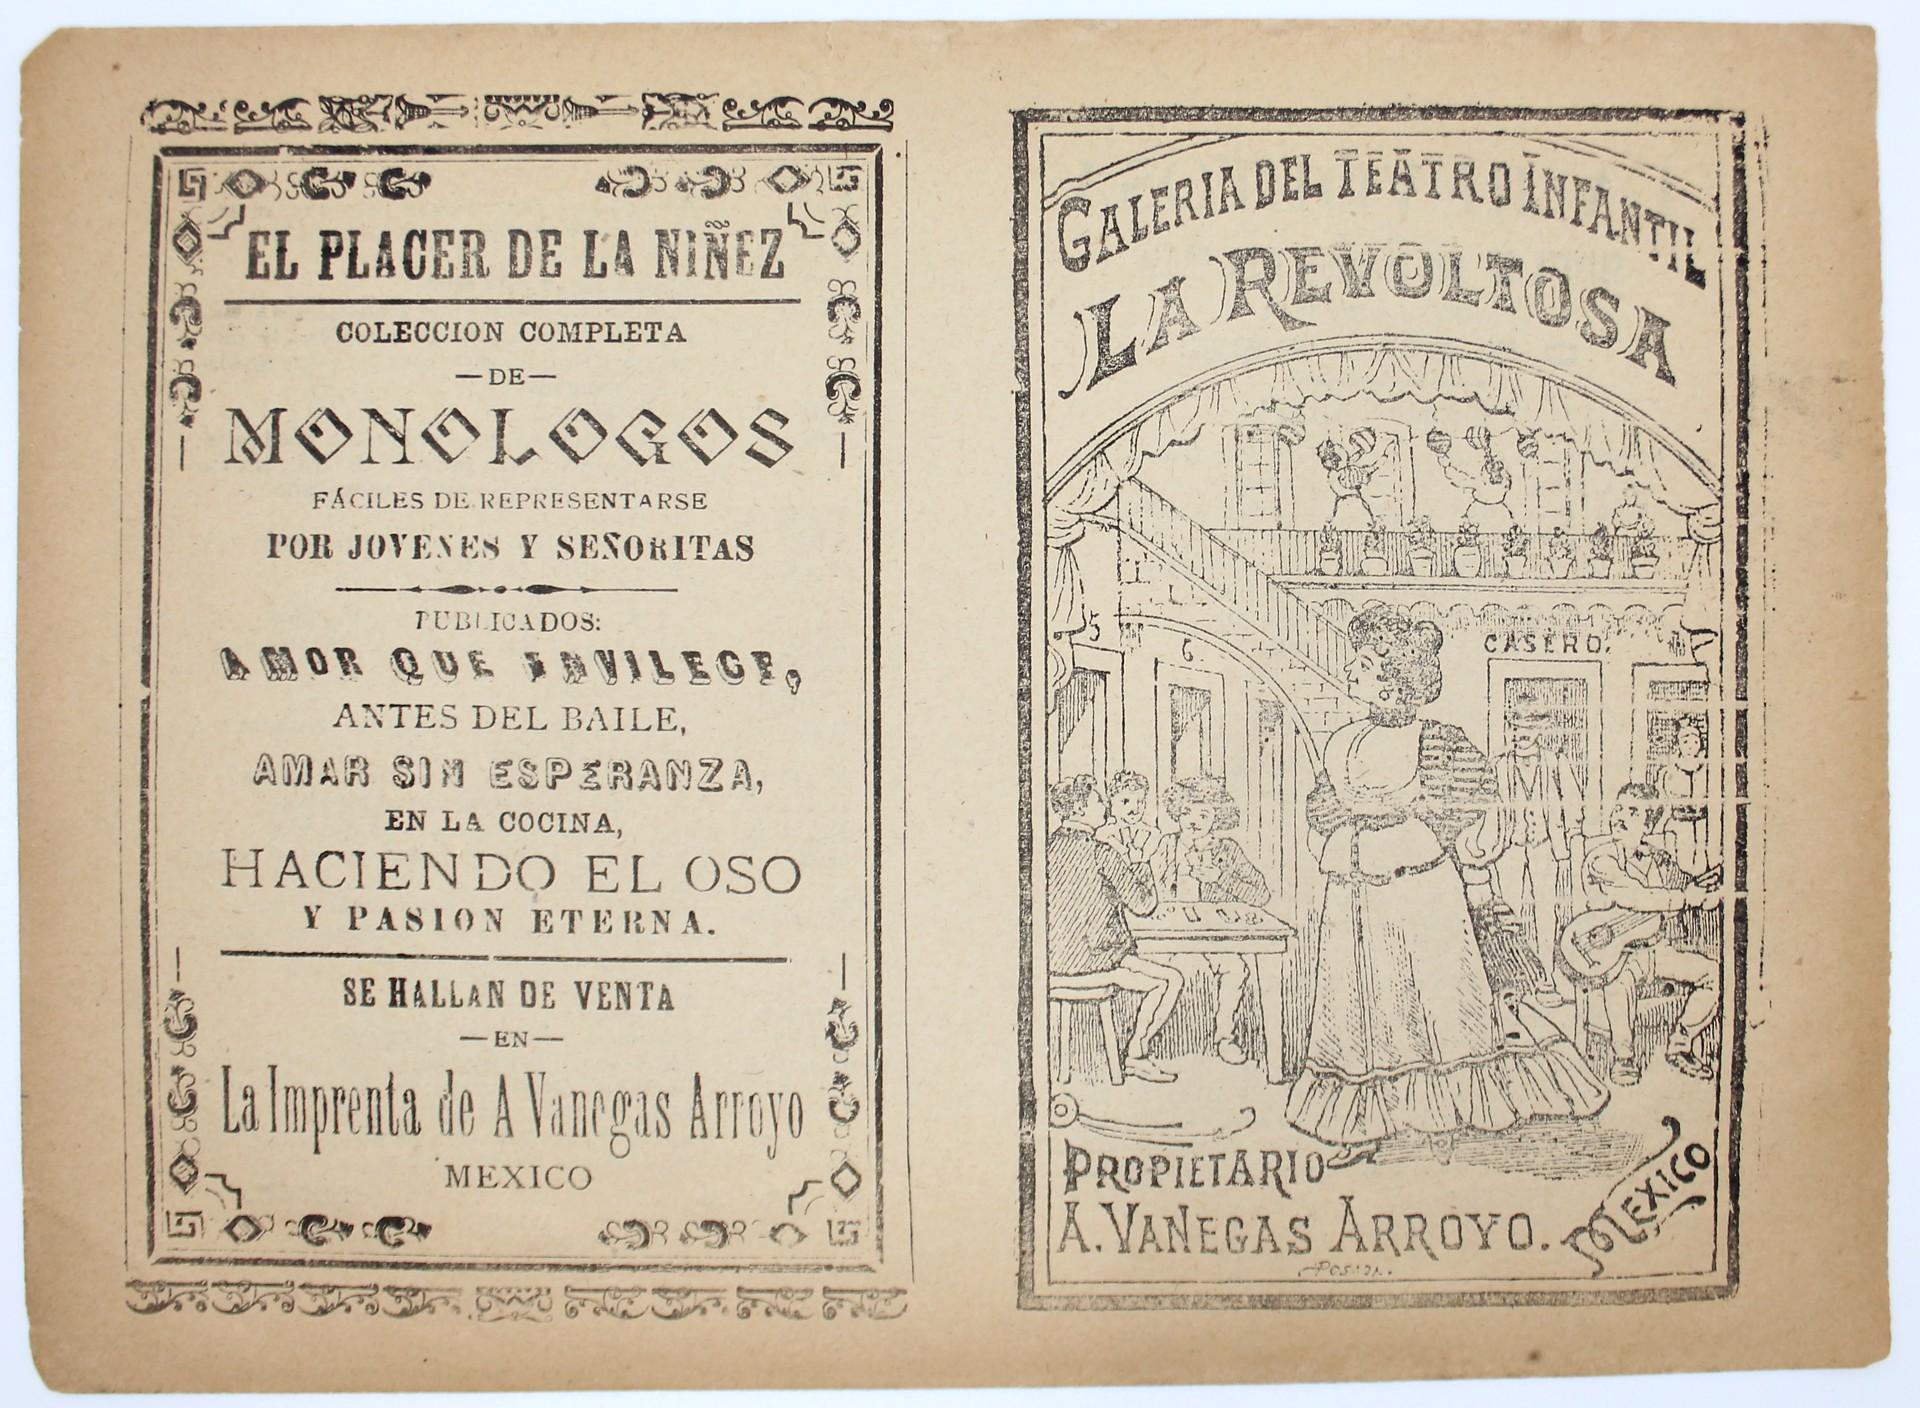 La Revoltosa (2nd Impression) by José Guadalupe Posada (1852 - 1913)